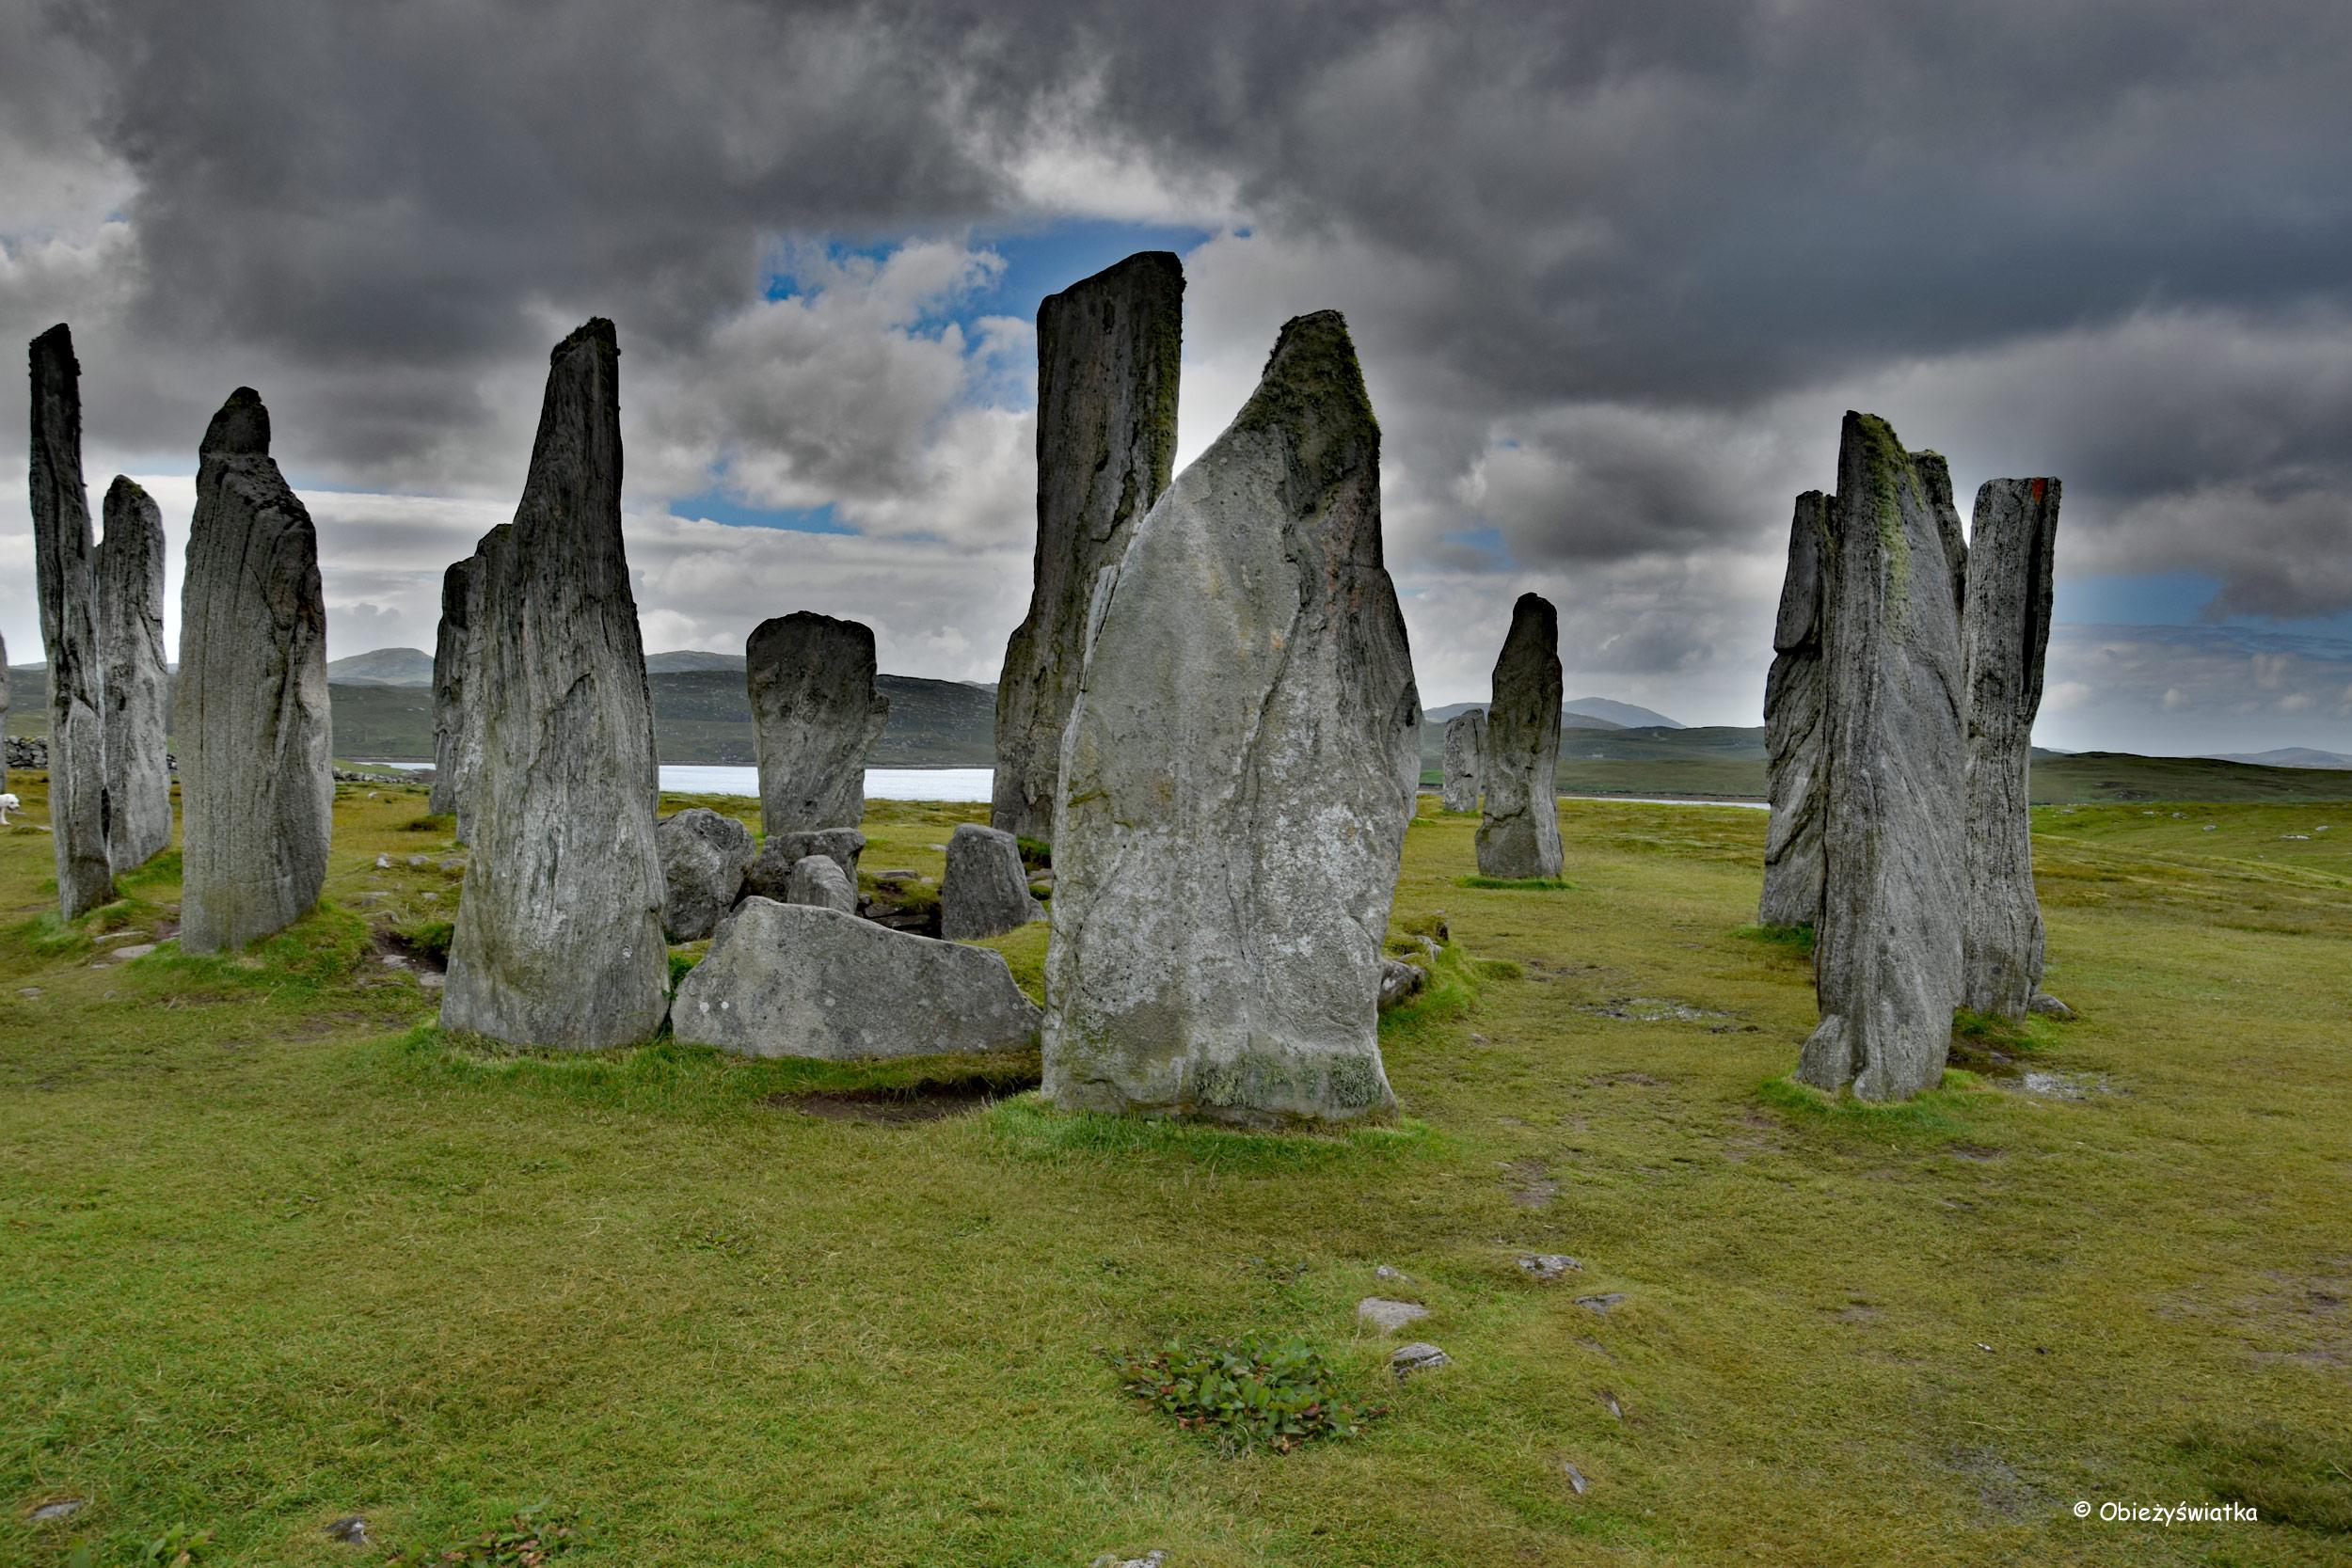 Kromlech / kamienny krąg, Callanish, Lewis and Harris